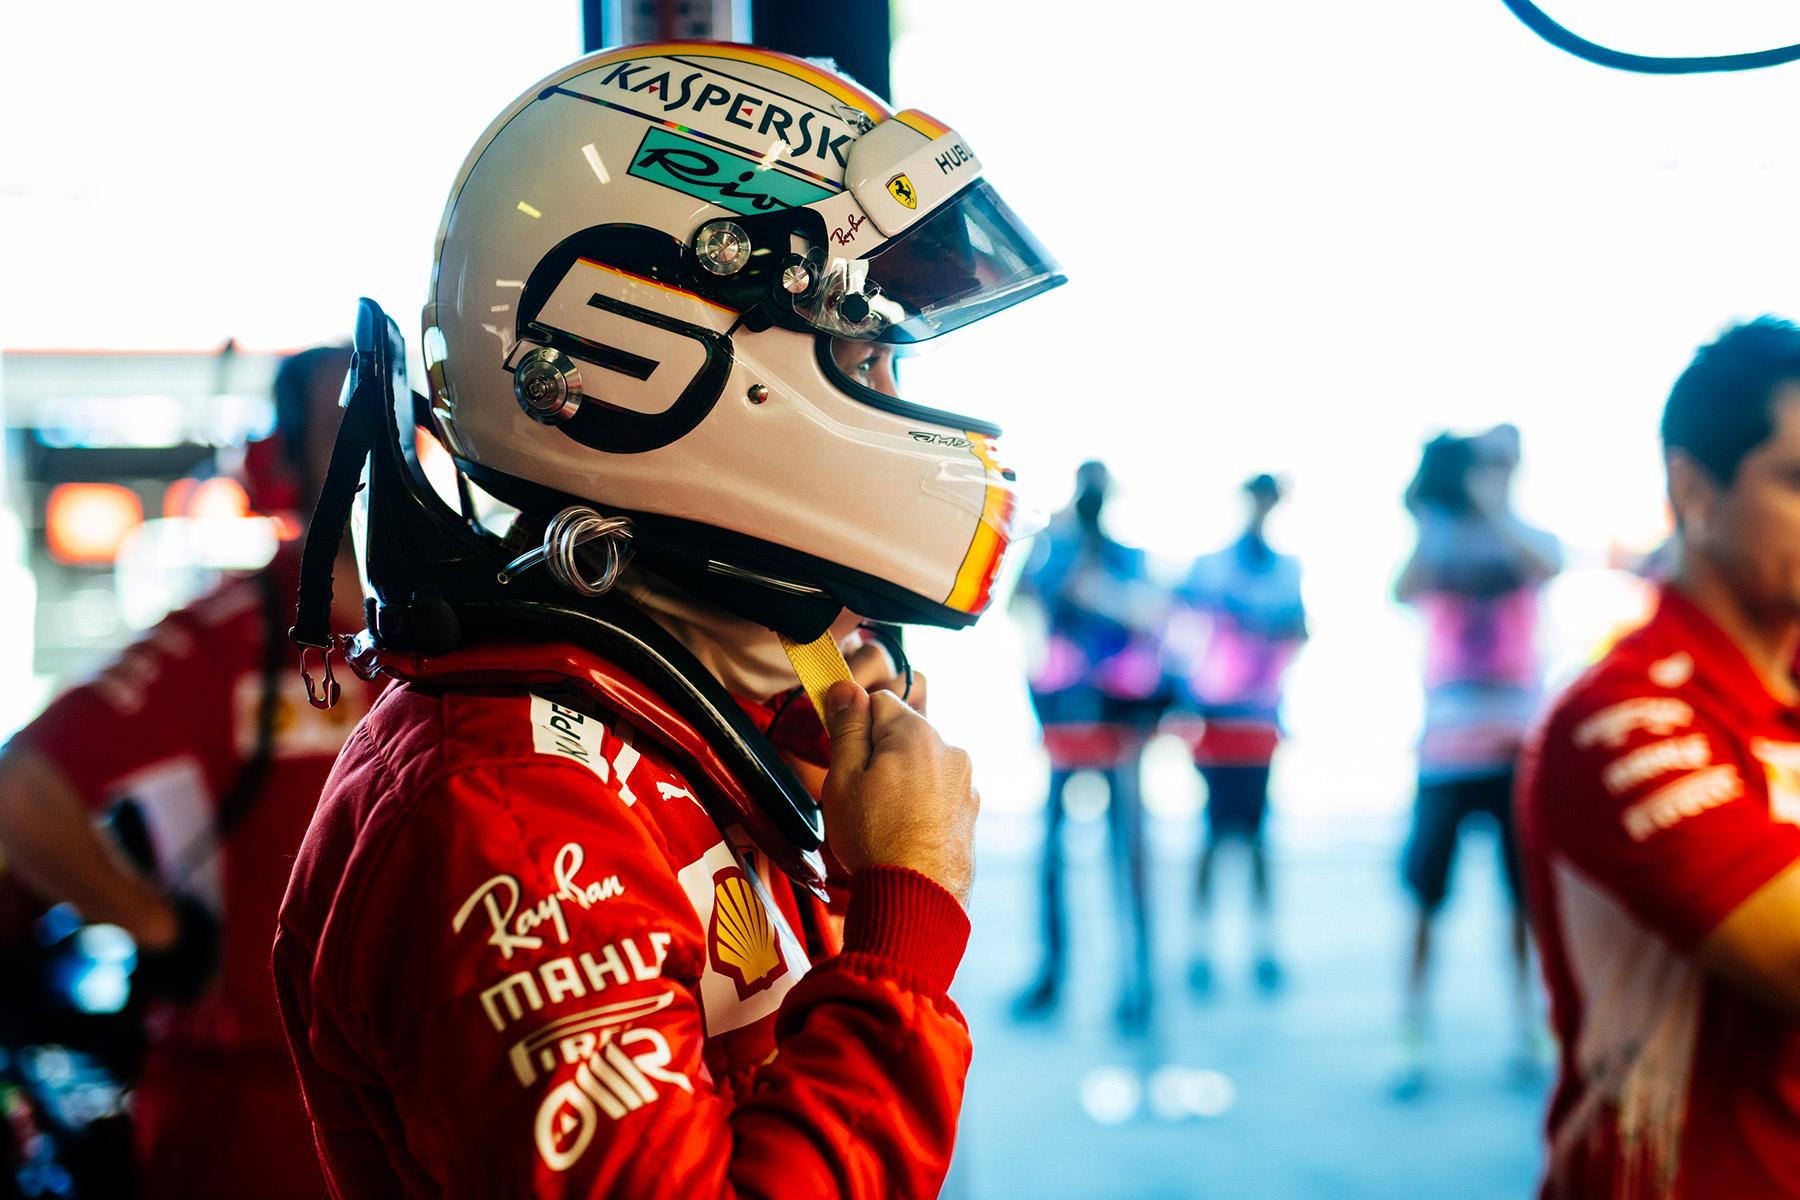 Sebastian Vettel in his garage at the Australian Grand Prix.